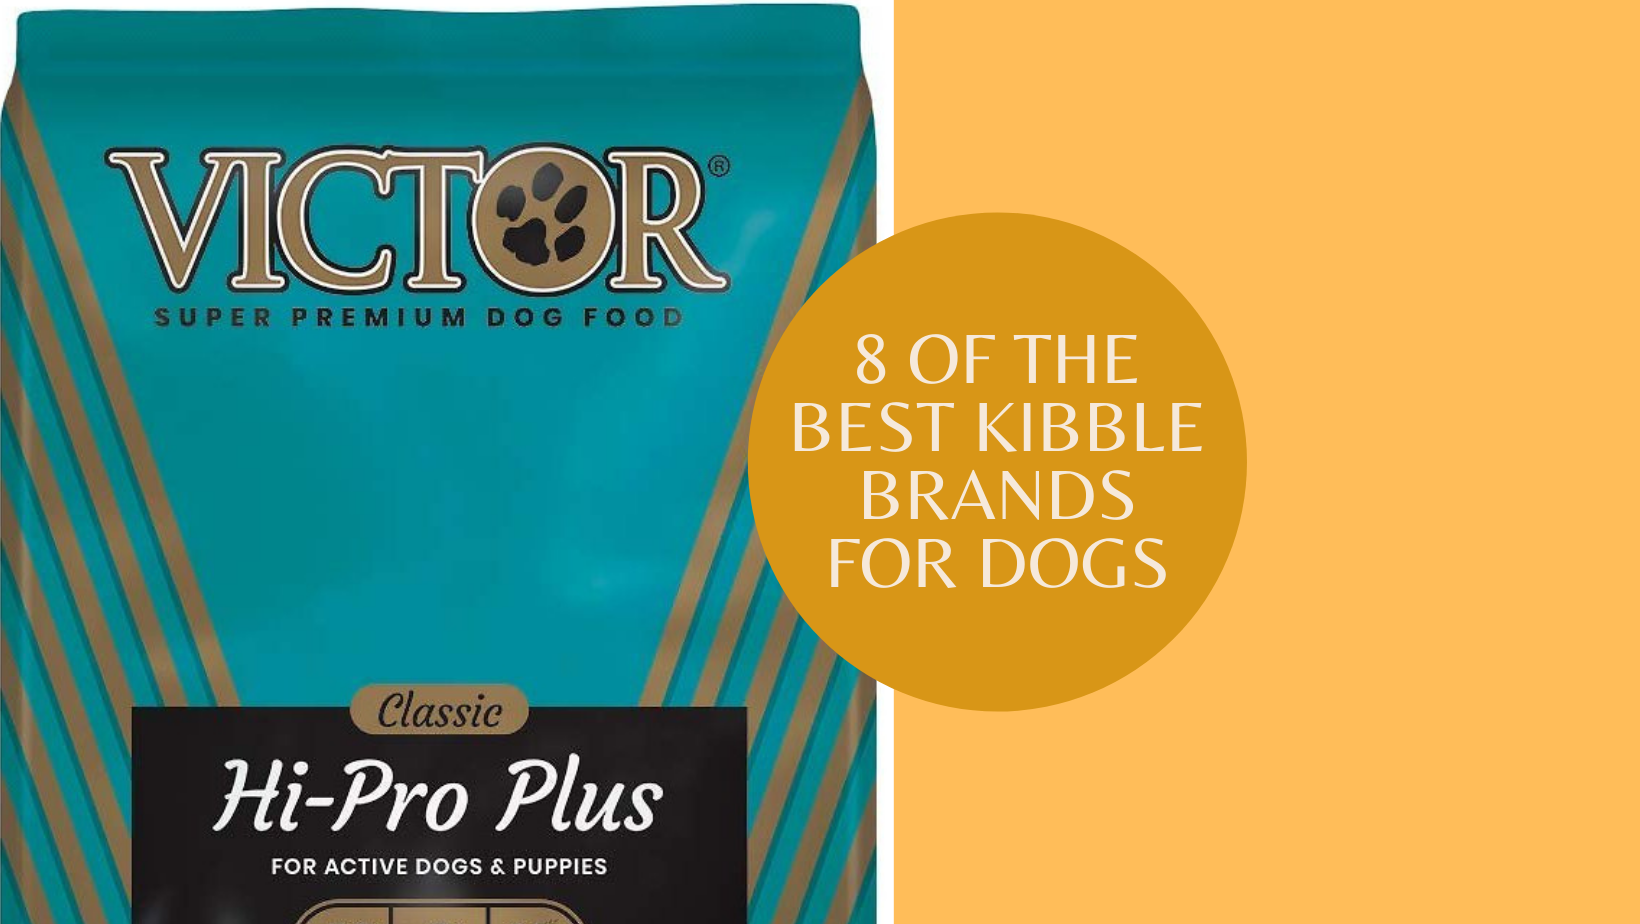 8 best kibble brands for dogs